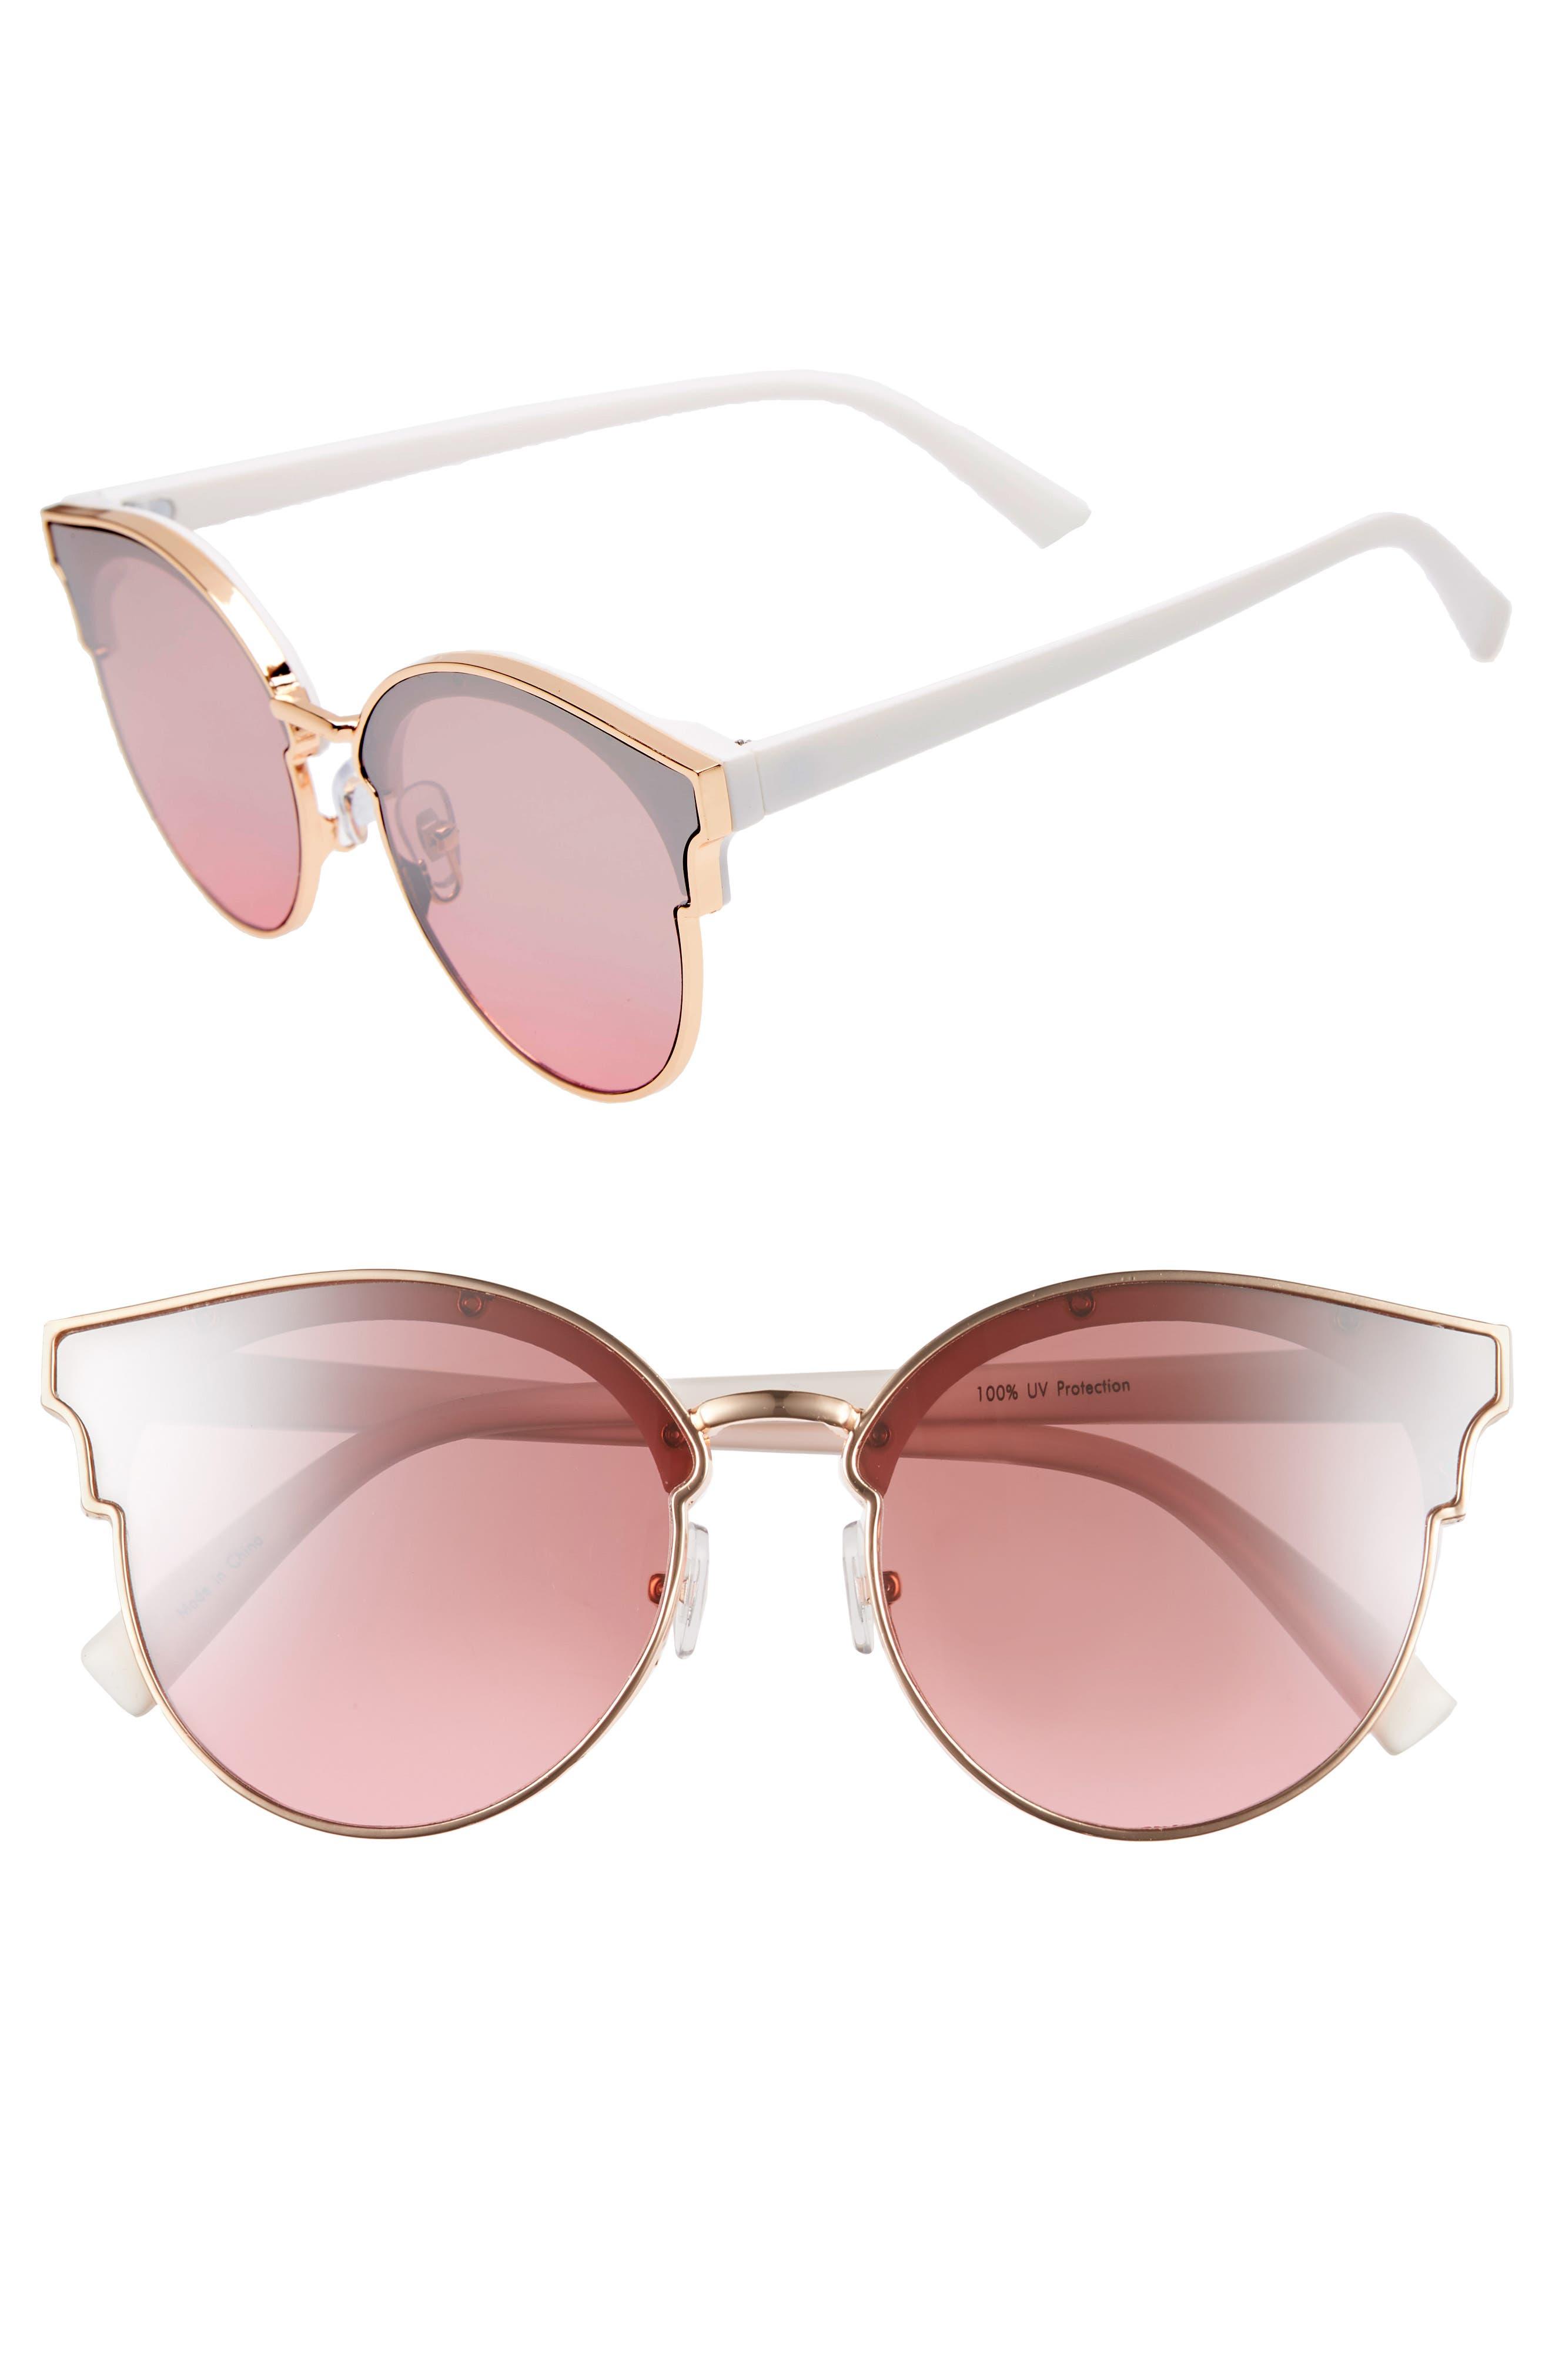 58mm Flat Cat Eye Sunglasses,                         Main,                         color,